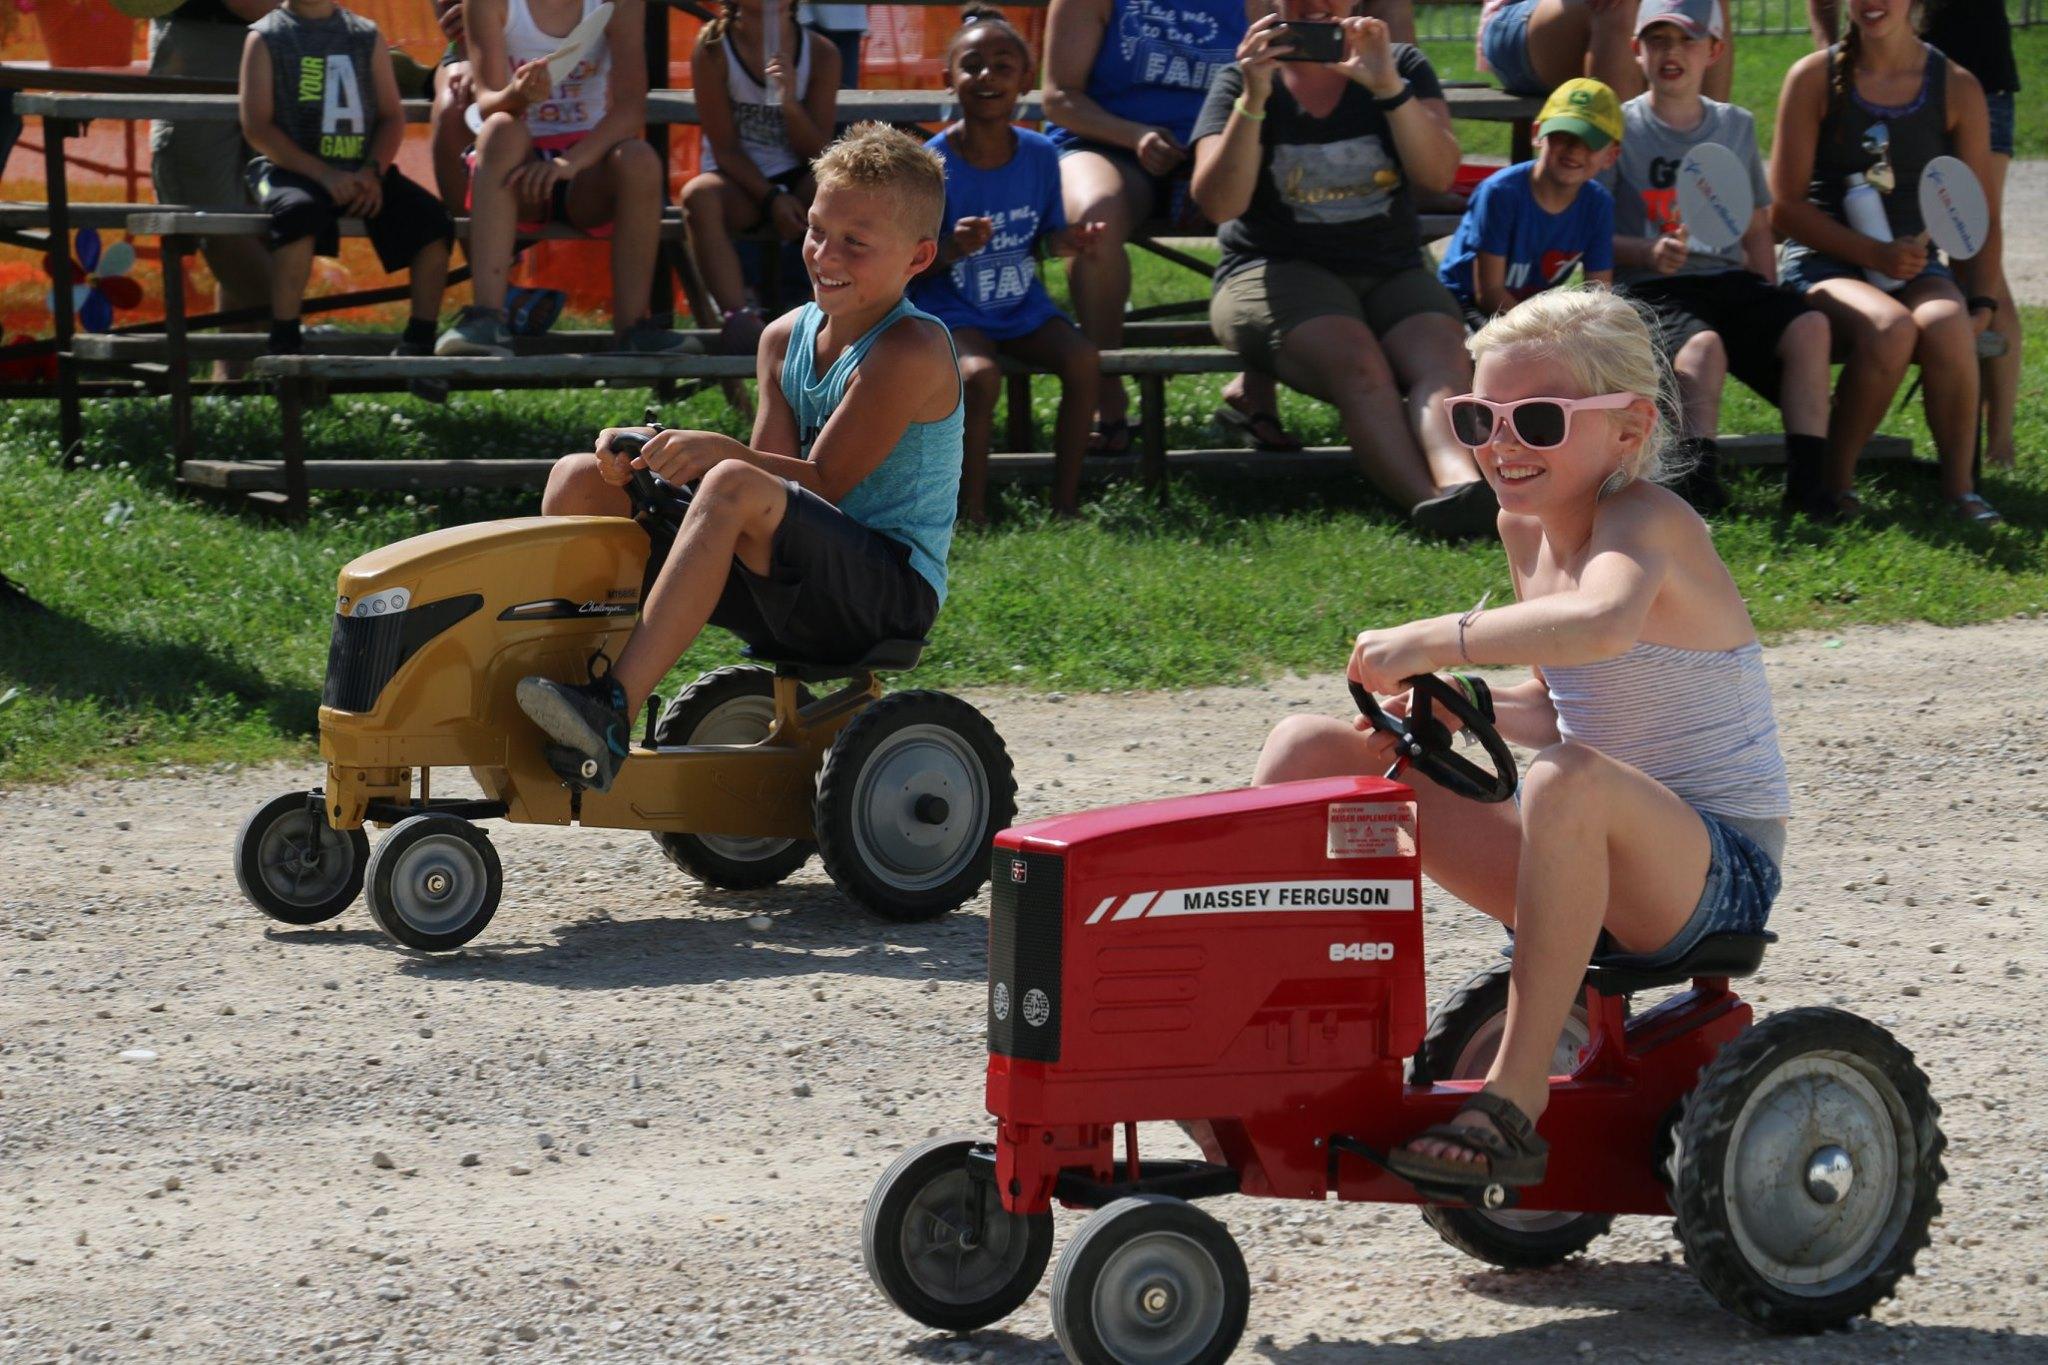 Allamakee County Fair (Waukon, IA)